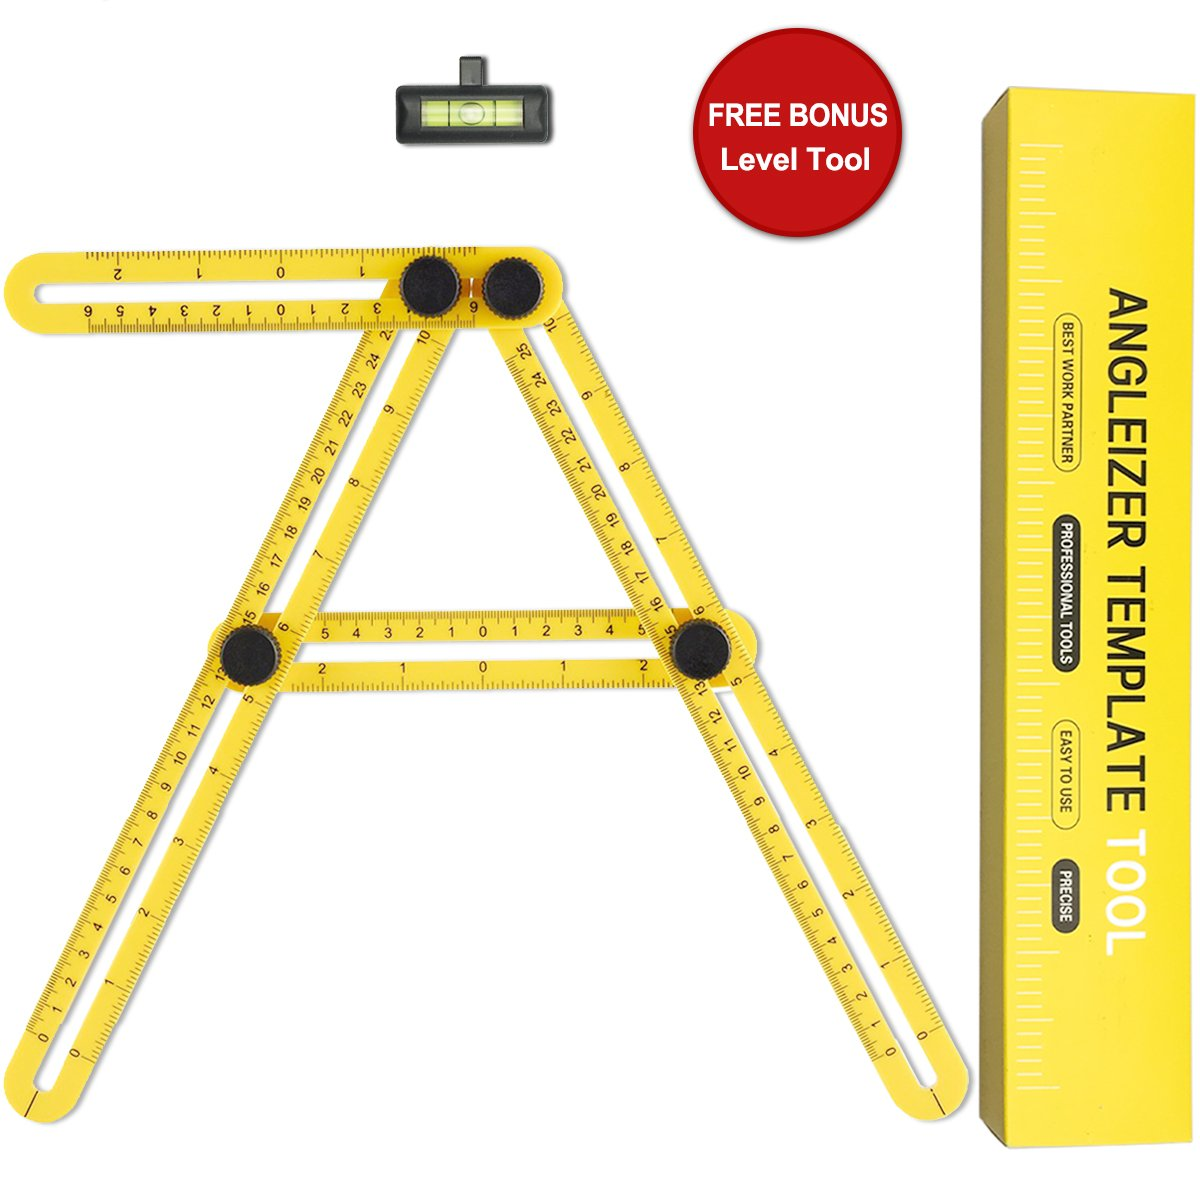 Angle-izer Template Tool, Lookka rè gle de mesure multi-angles instrument de mesure avec rè gle niveau Lookka règle de mesure multi-angles instrument de mesure avec règle niveau